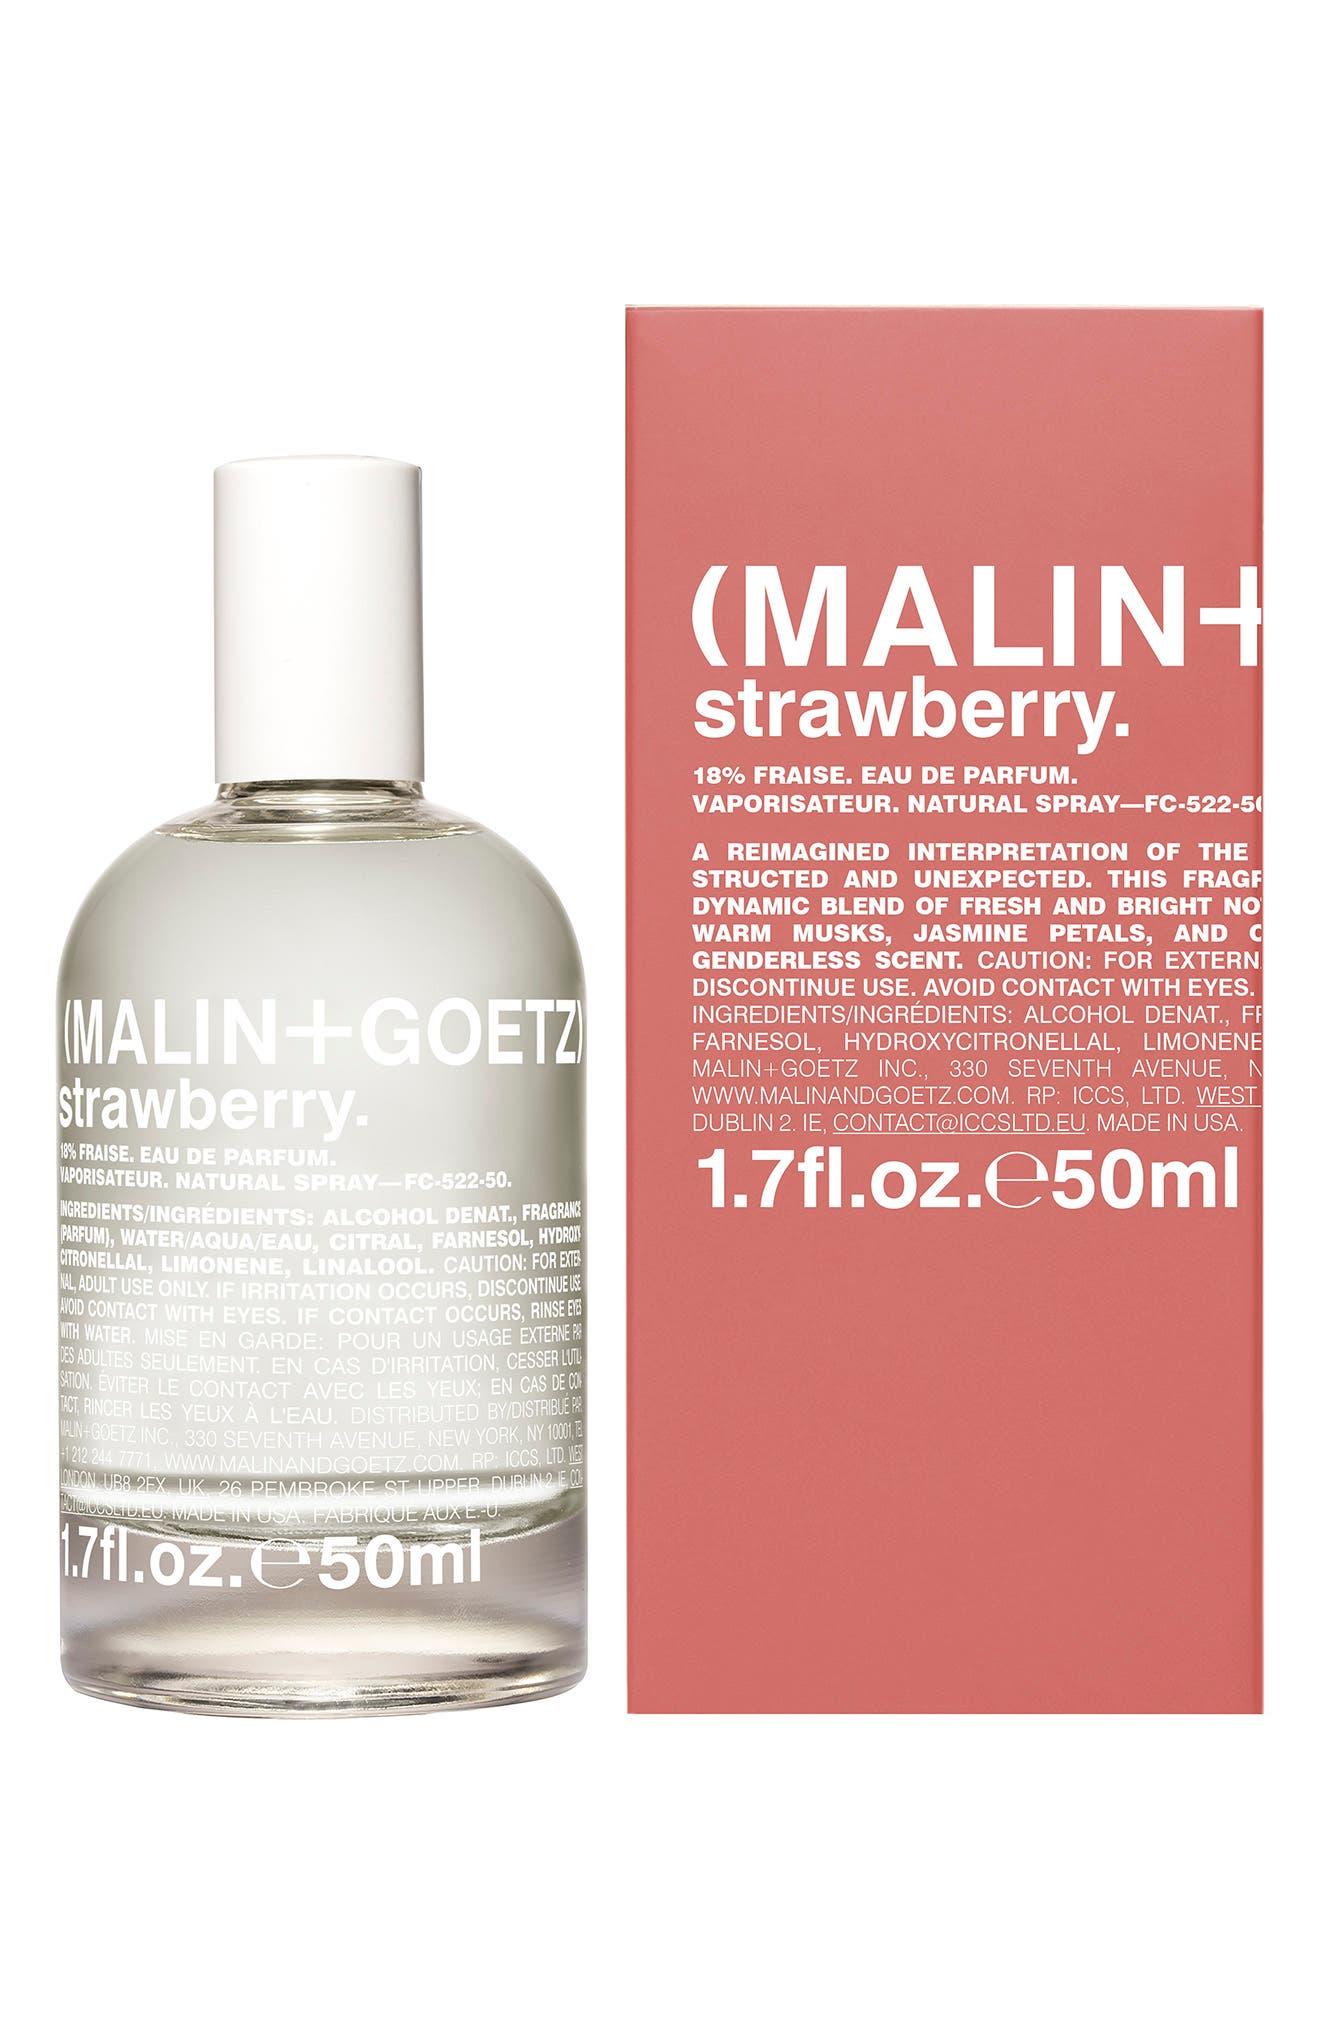 Malin+Goetz Strawberry Eau De Parfum (Nordstrom Exclusive)